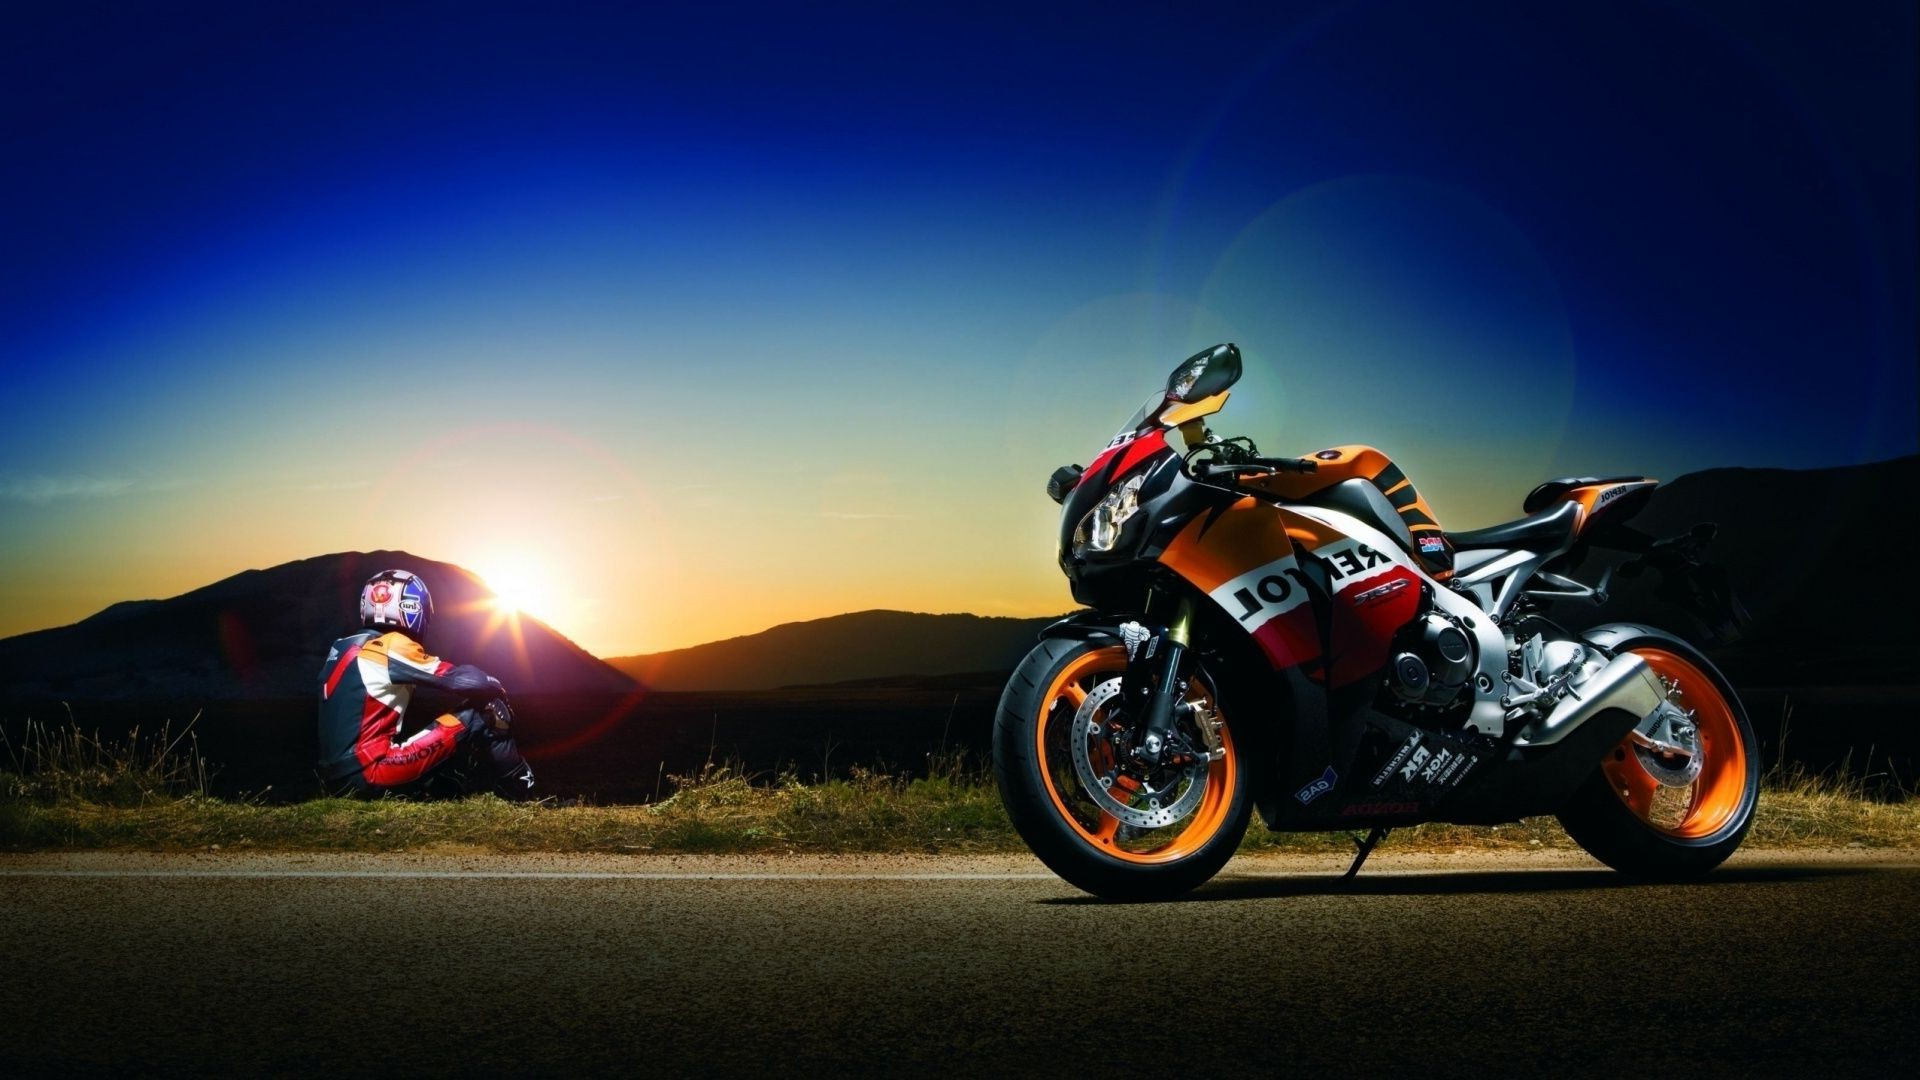 мотоциклы обои на рабочий стол фото № 596481 бесплатно